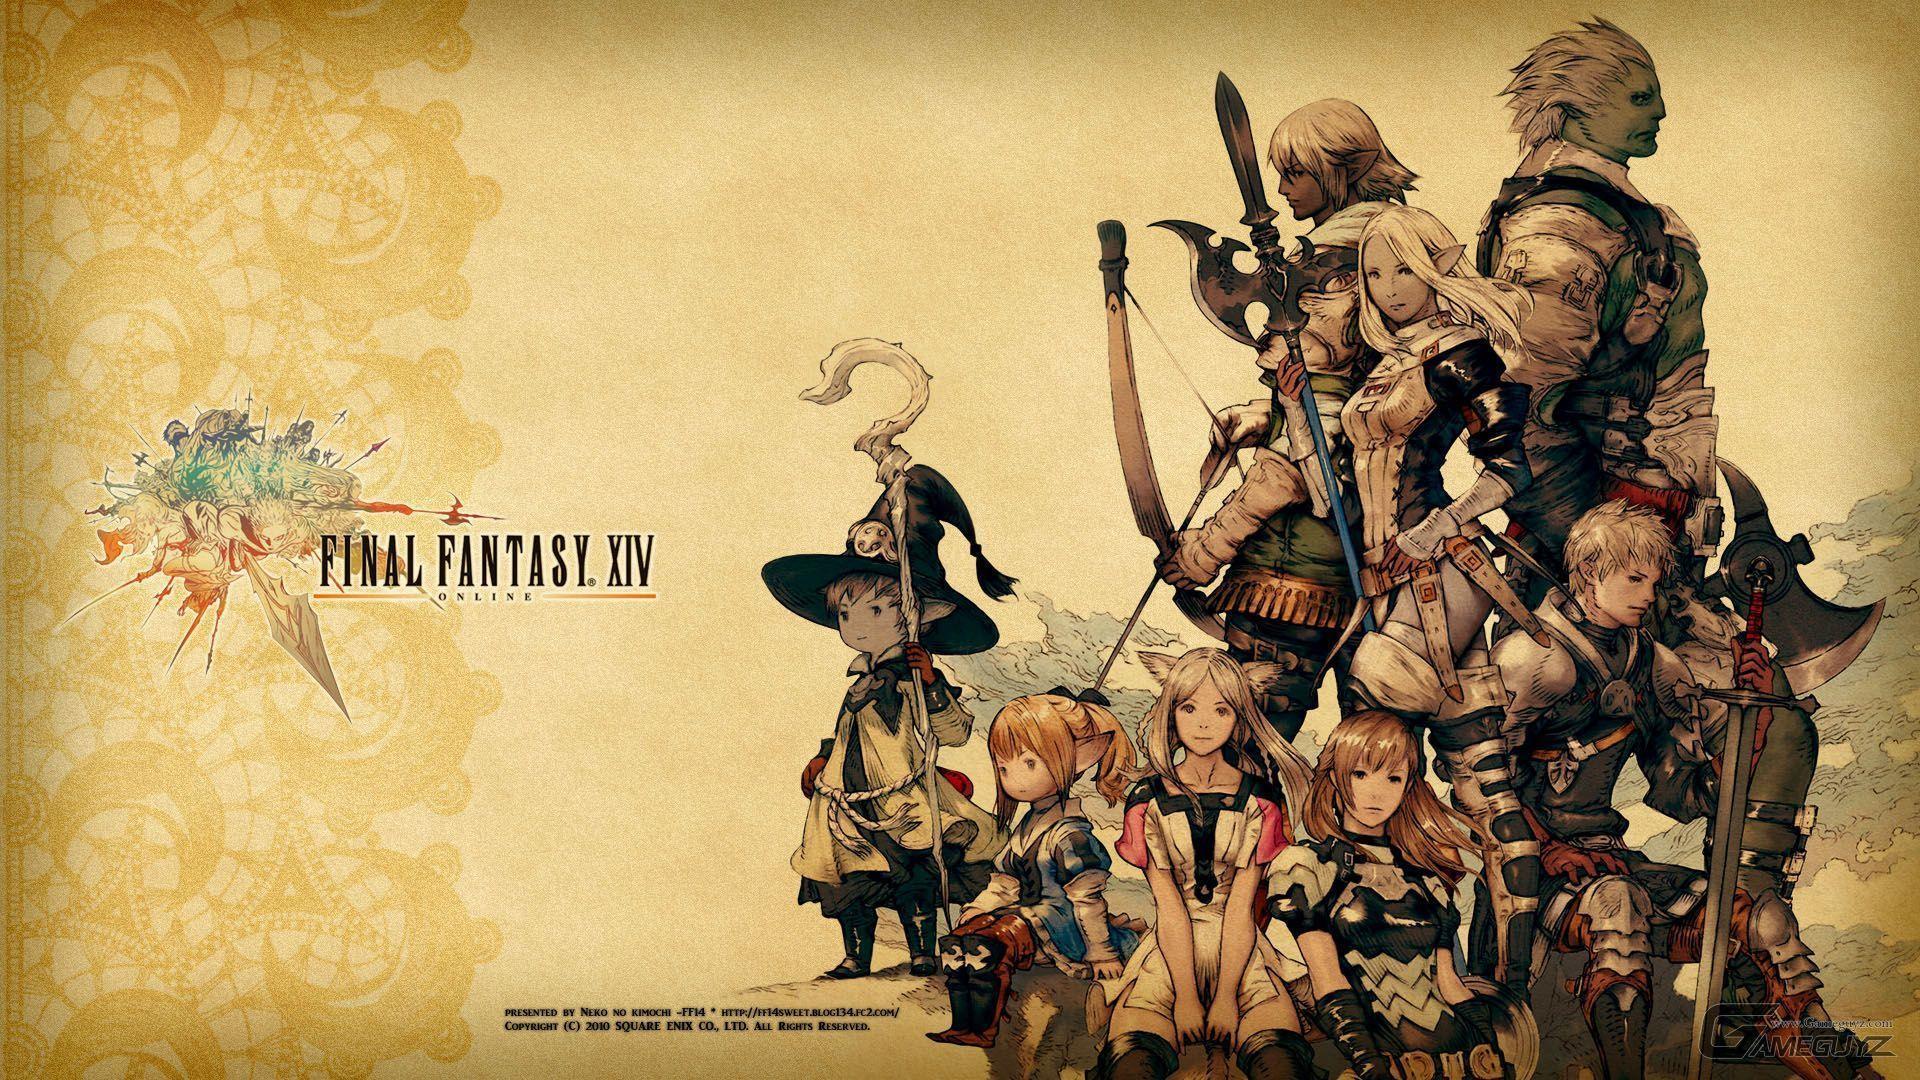 Final fantasy xiv wallpapers wallpaper cave - Ffxiv wallpaper 1080p ...